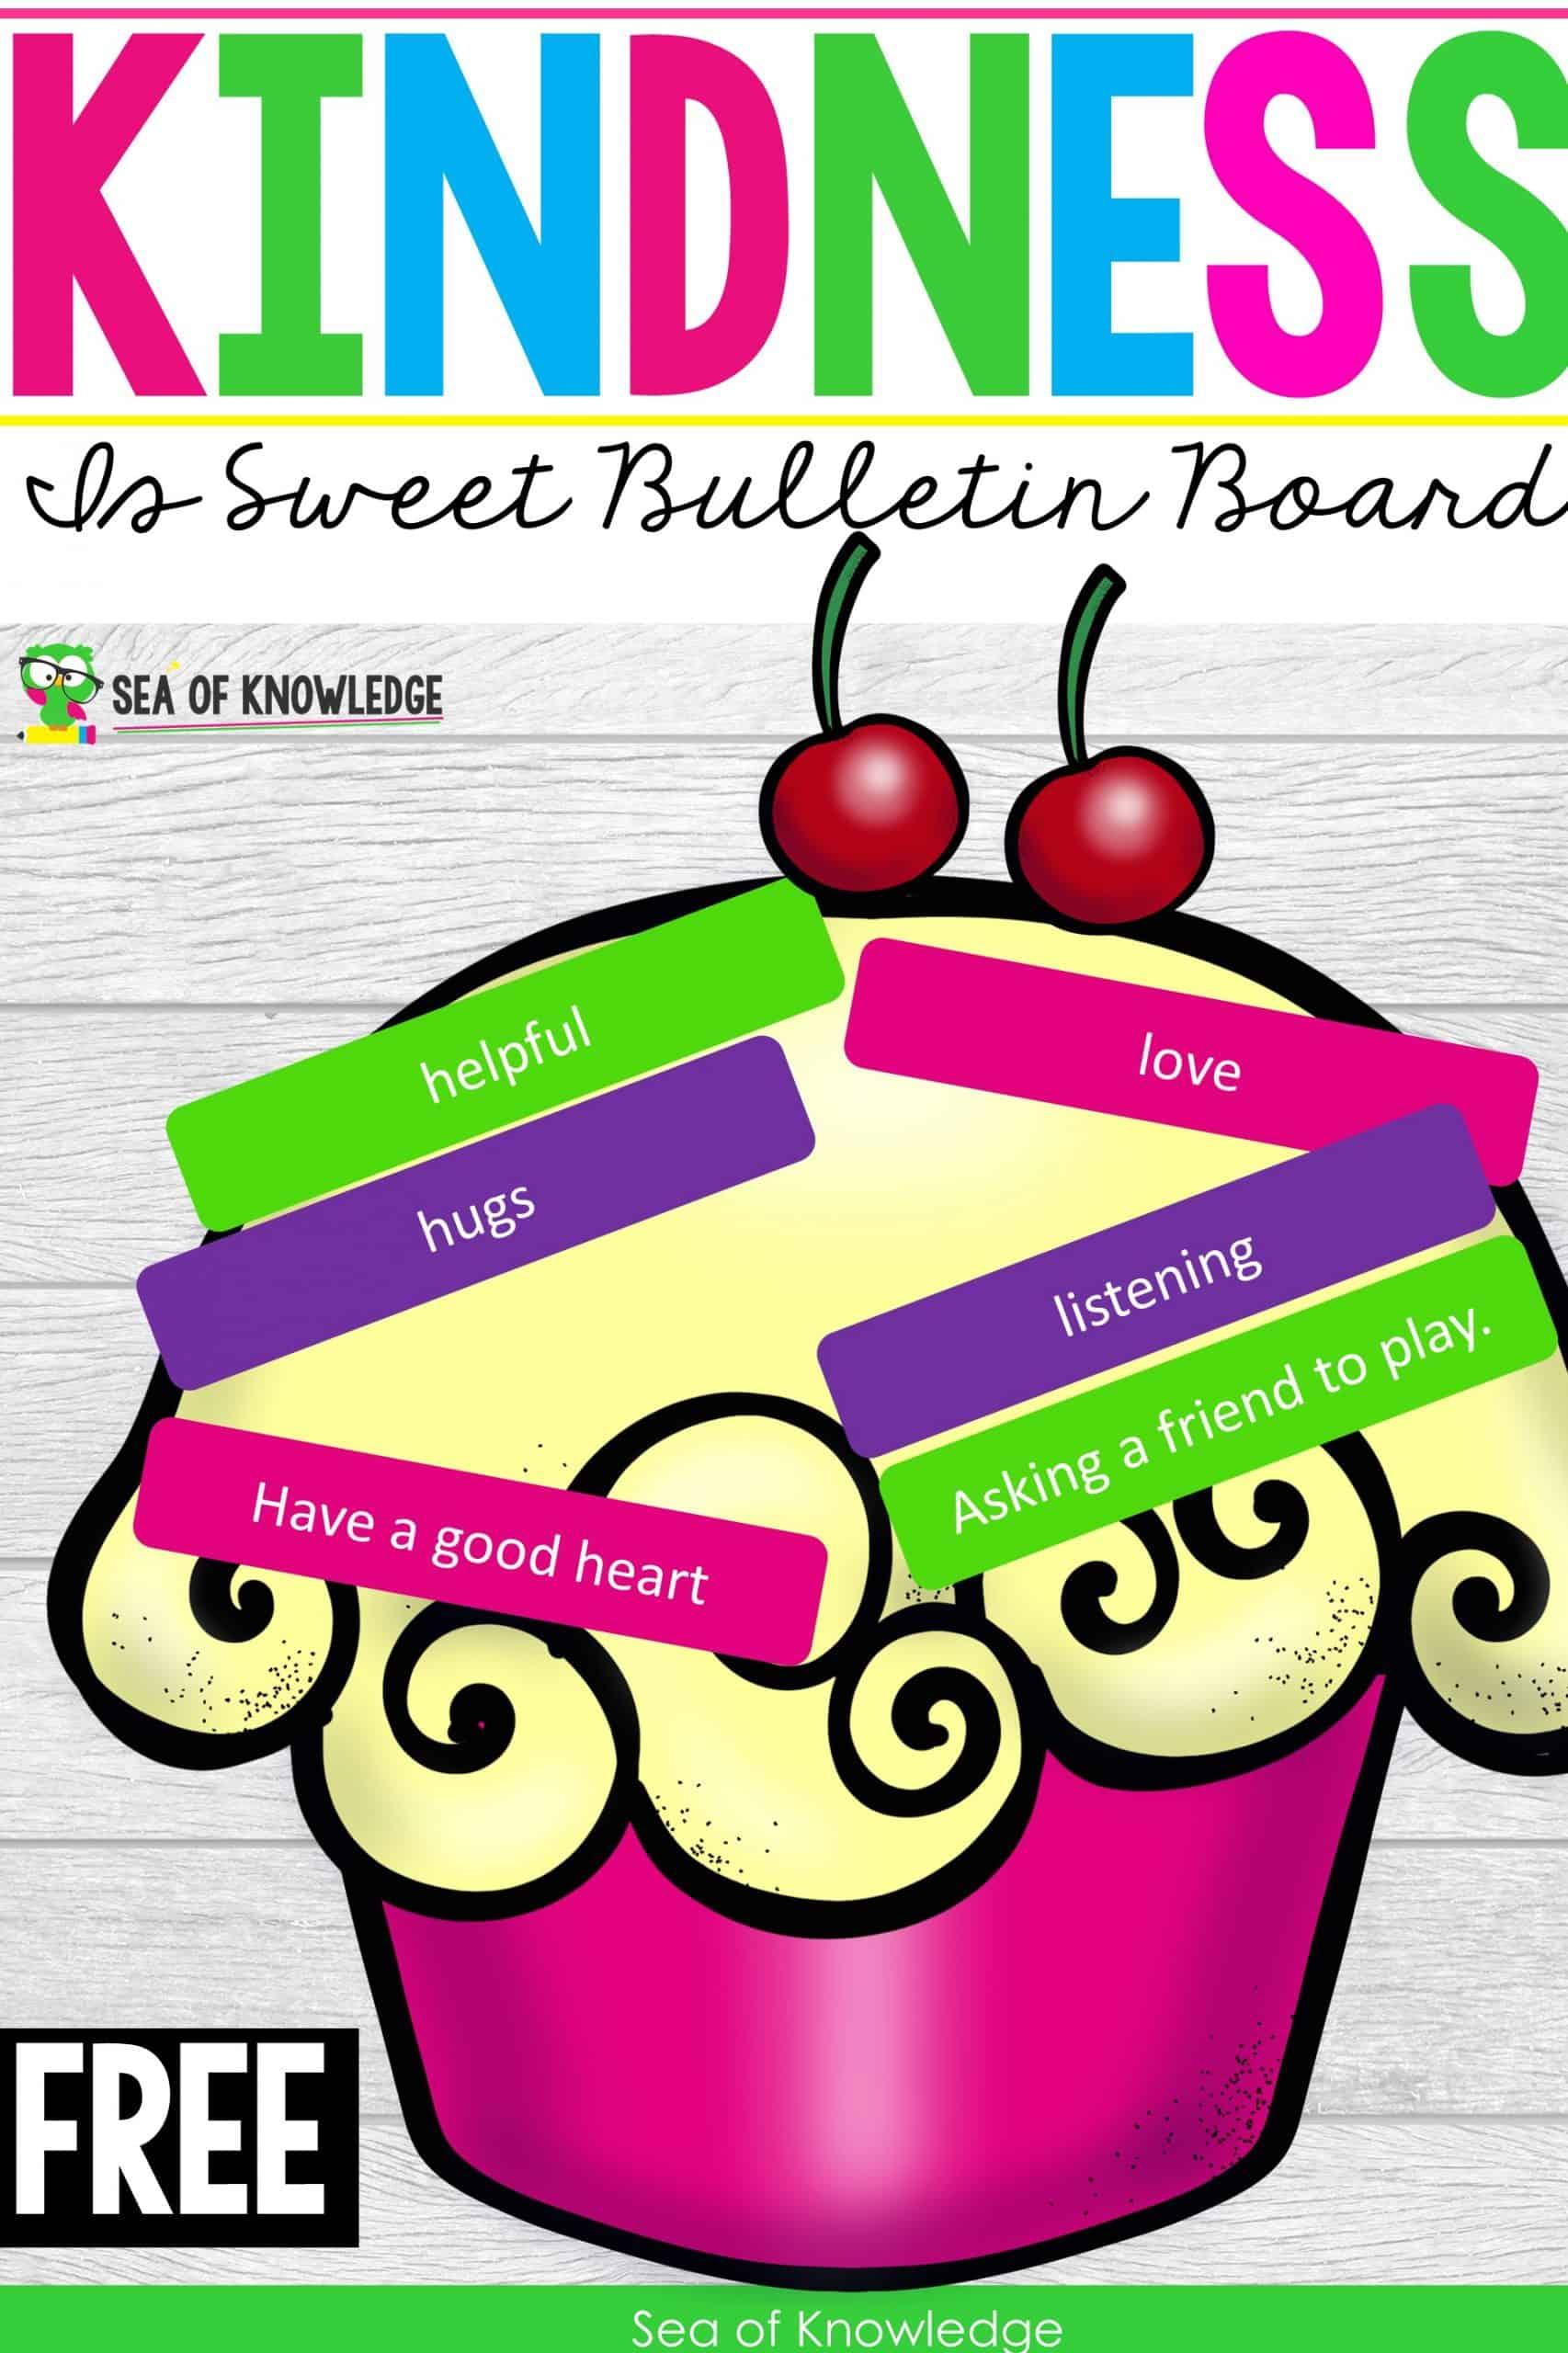 Kindness is Sweet Bulletin Board Ideas Ice Cream Templates inside!